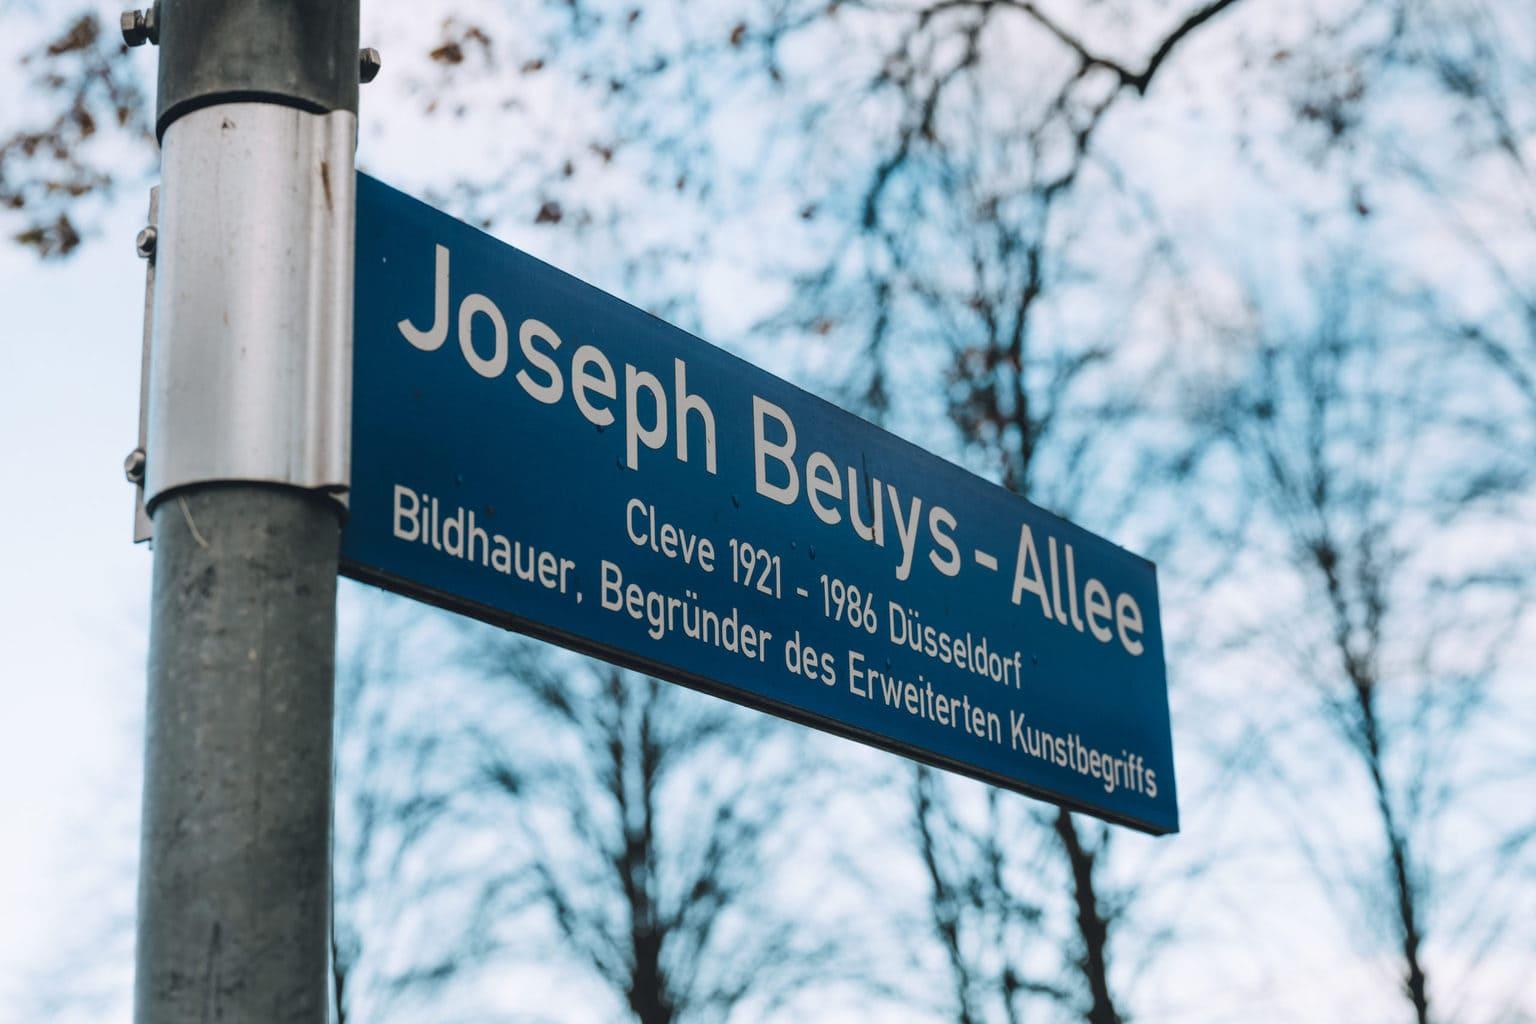 Straat die naar kunstenaar Joseph Beuys ins benoemd in Kleef